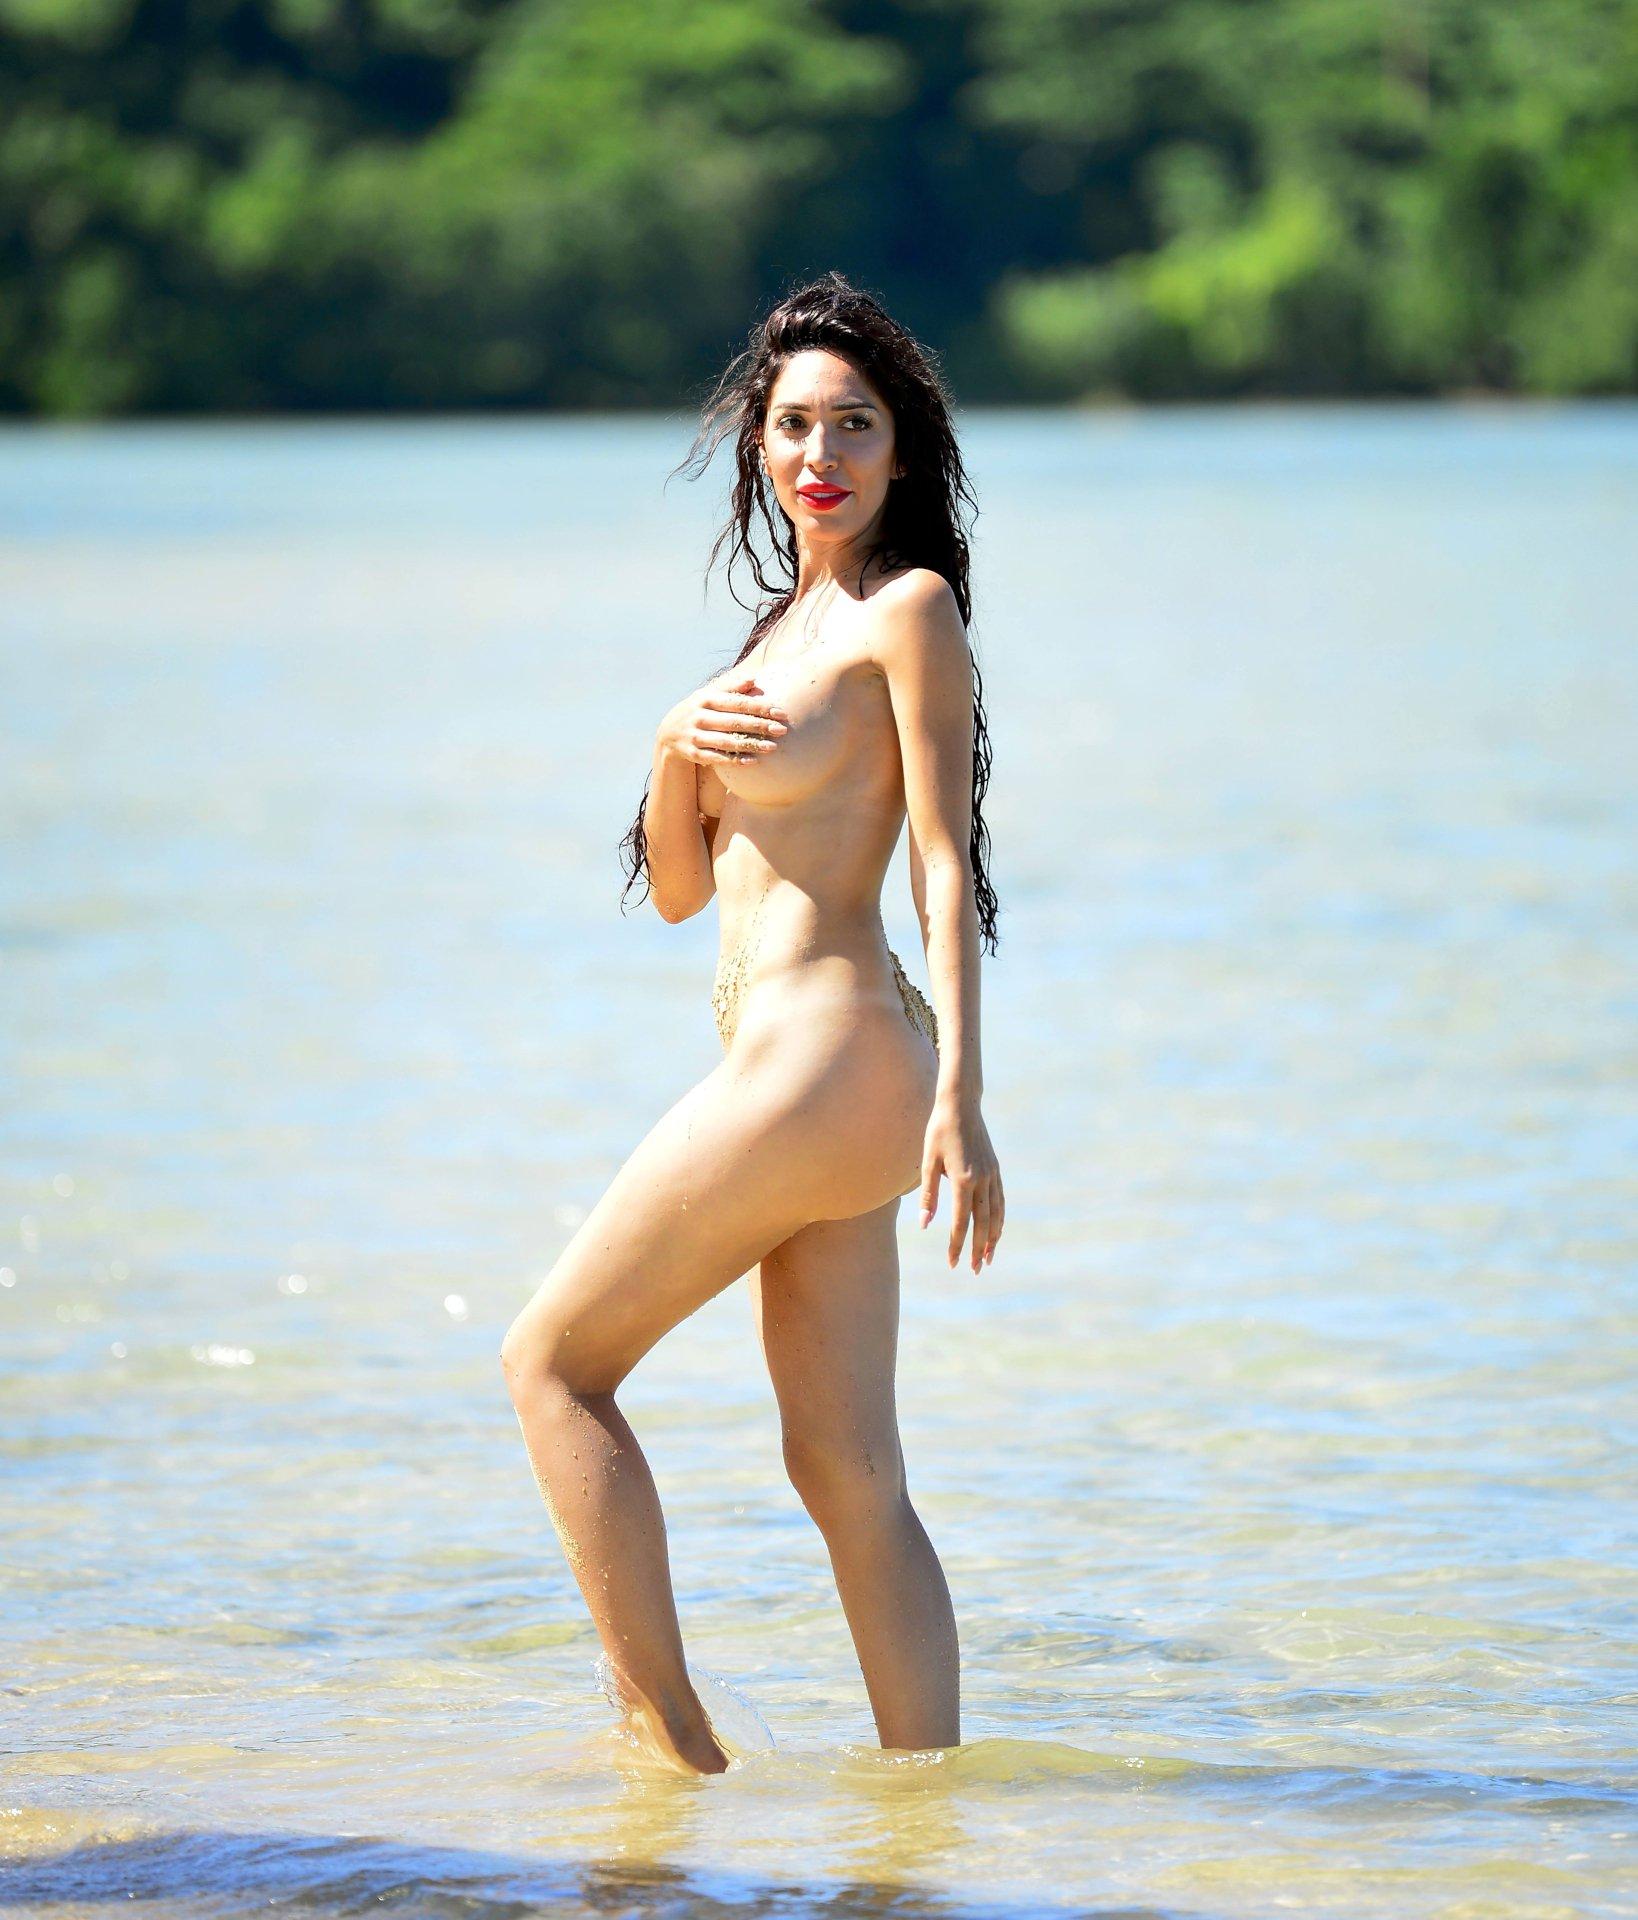 Nude Farrah Abraham naked (64 photos), Pussy, Sideboobs, Boobs, lingerie 2018